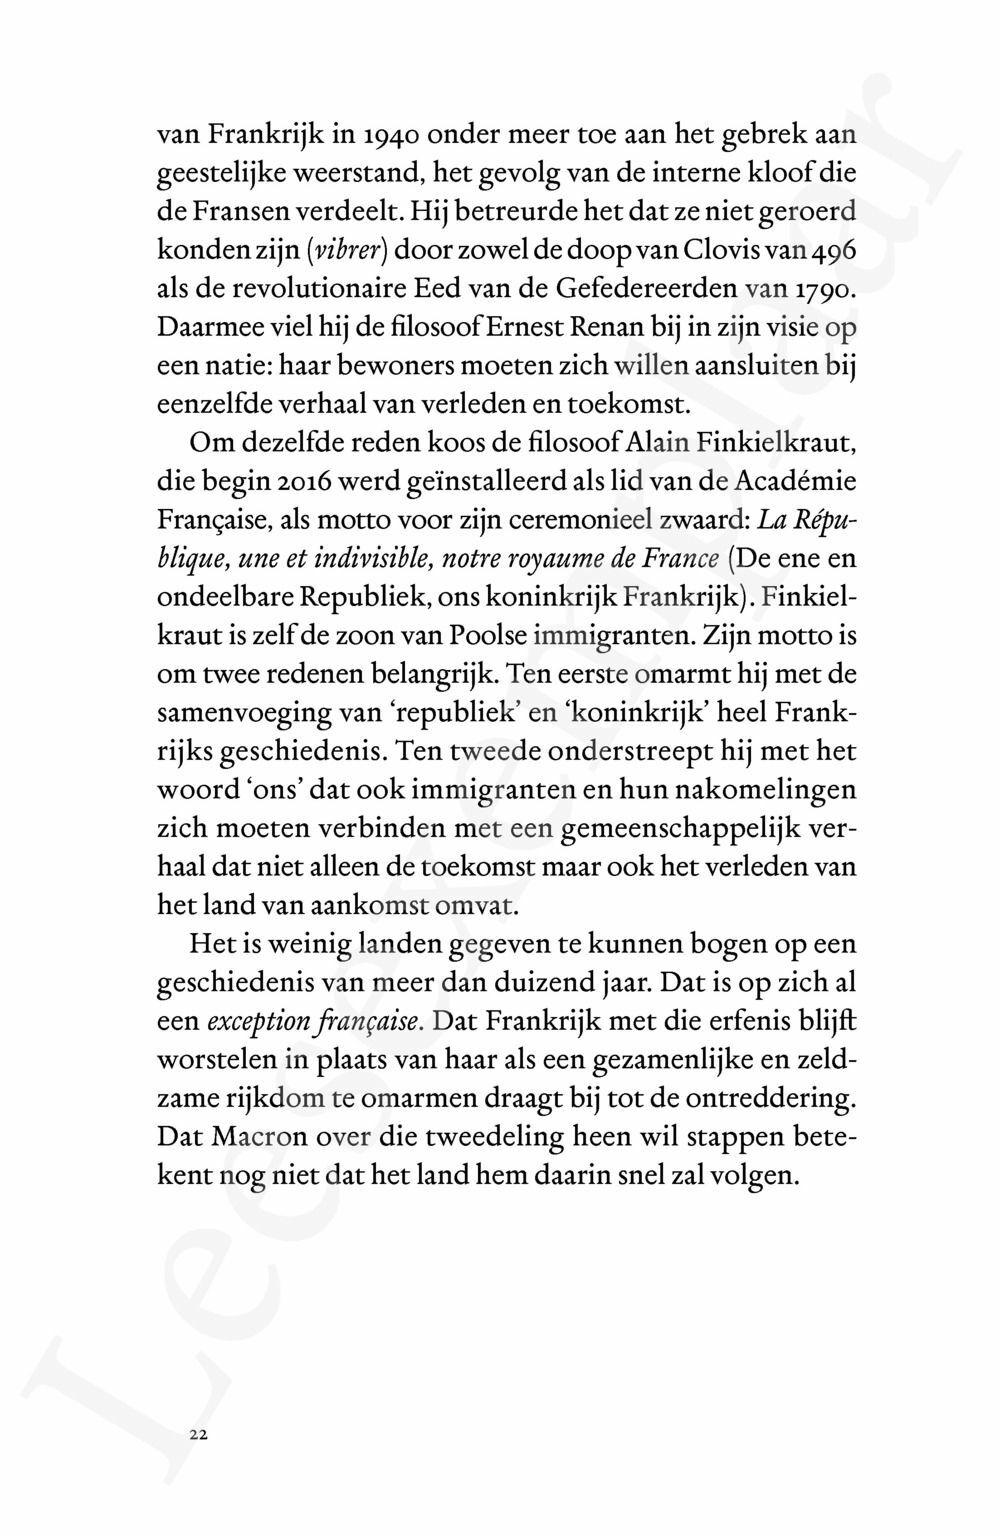 Preview: Ontredderde republiek (update - nieuwe editie tot en met Macron)